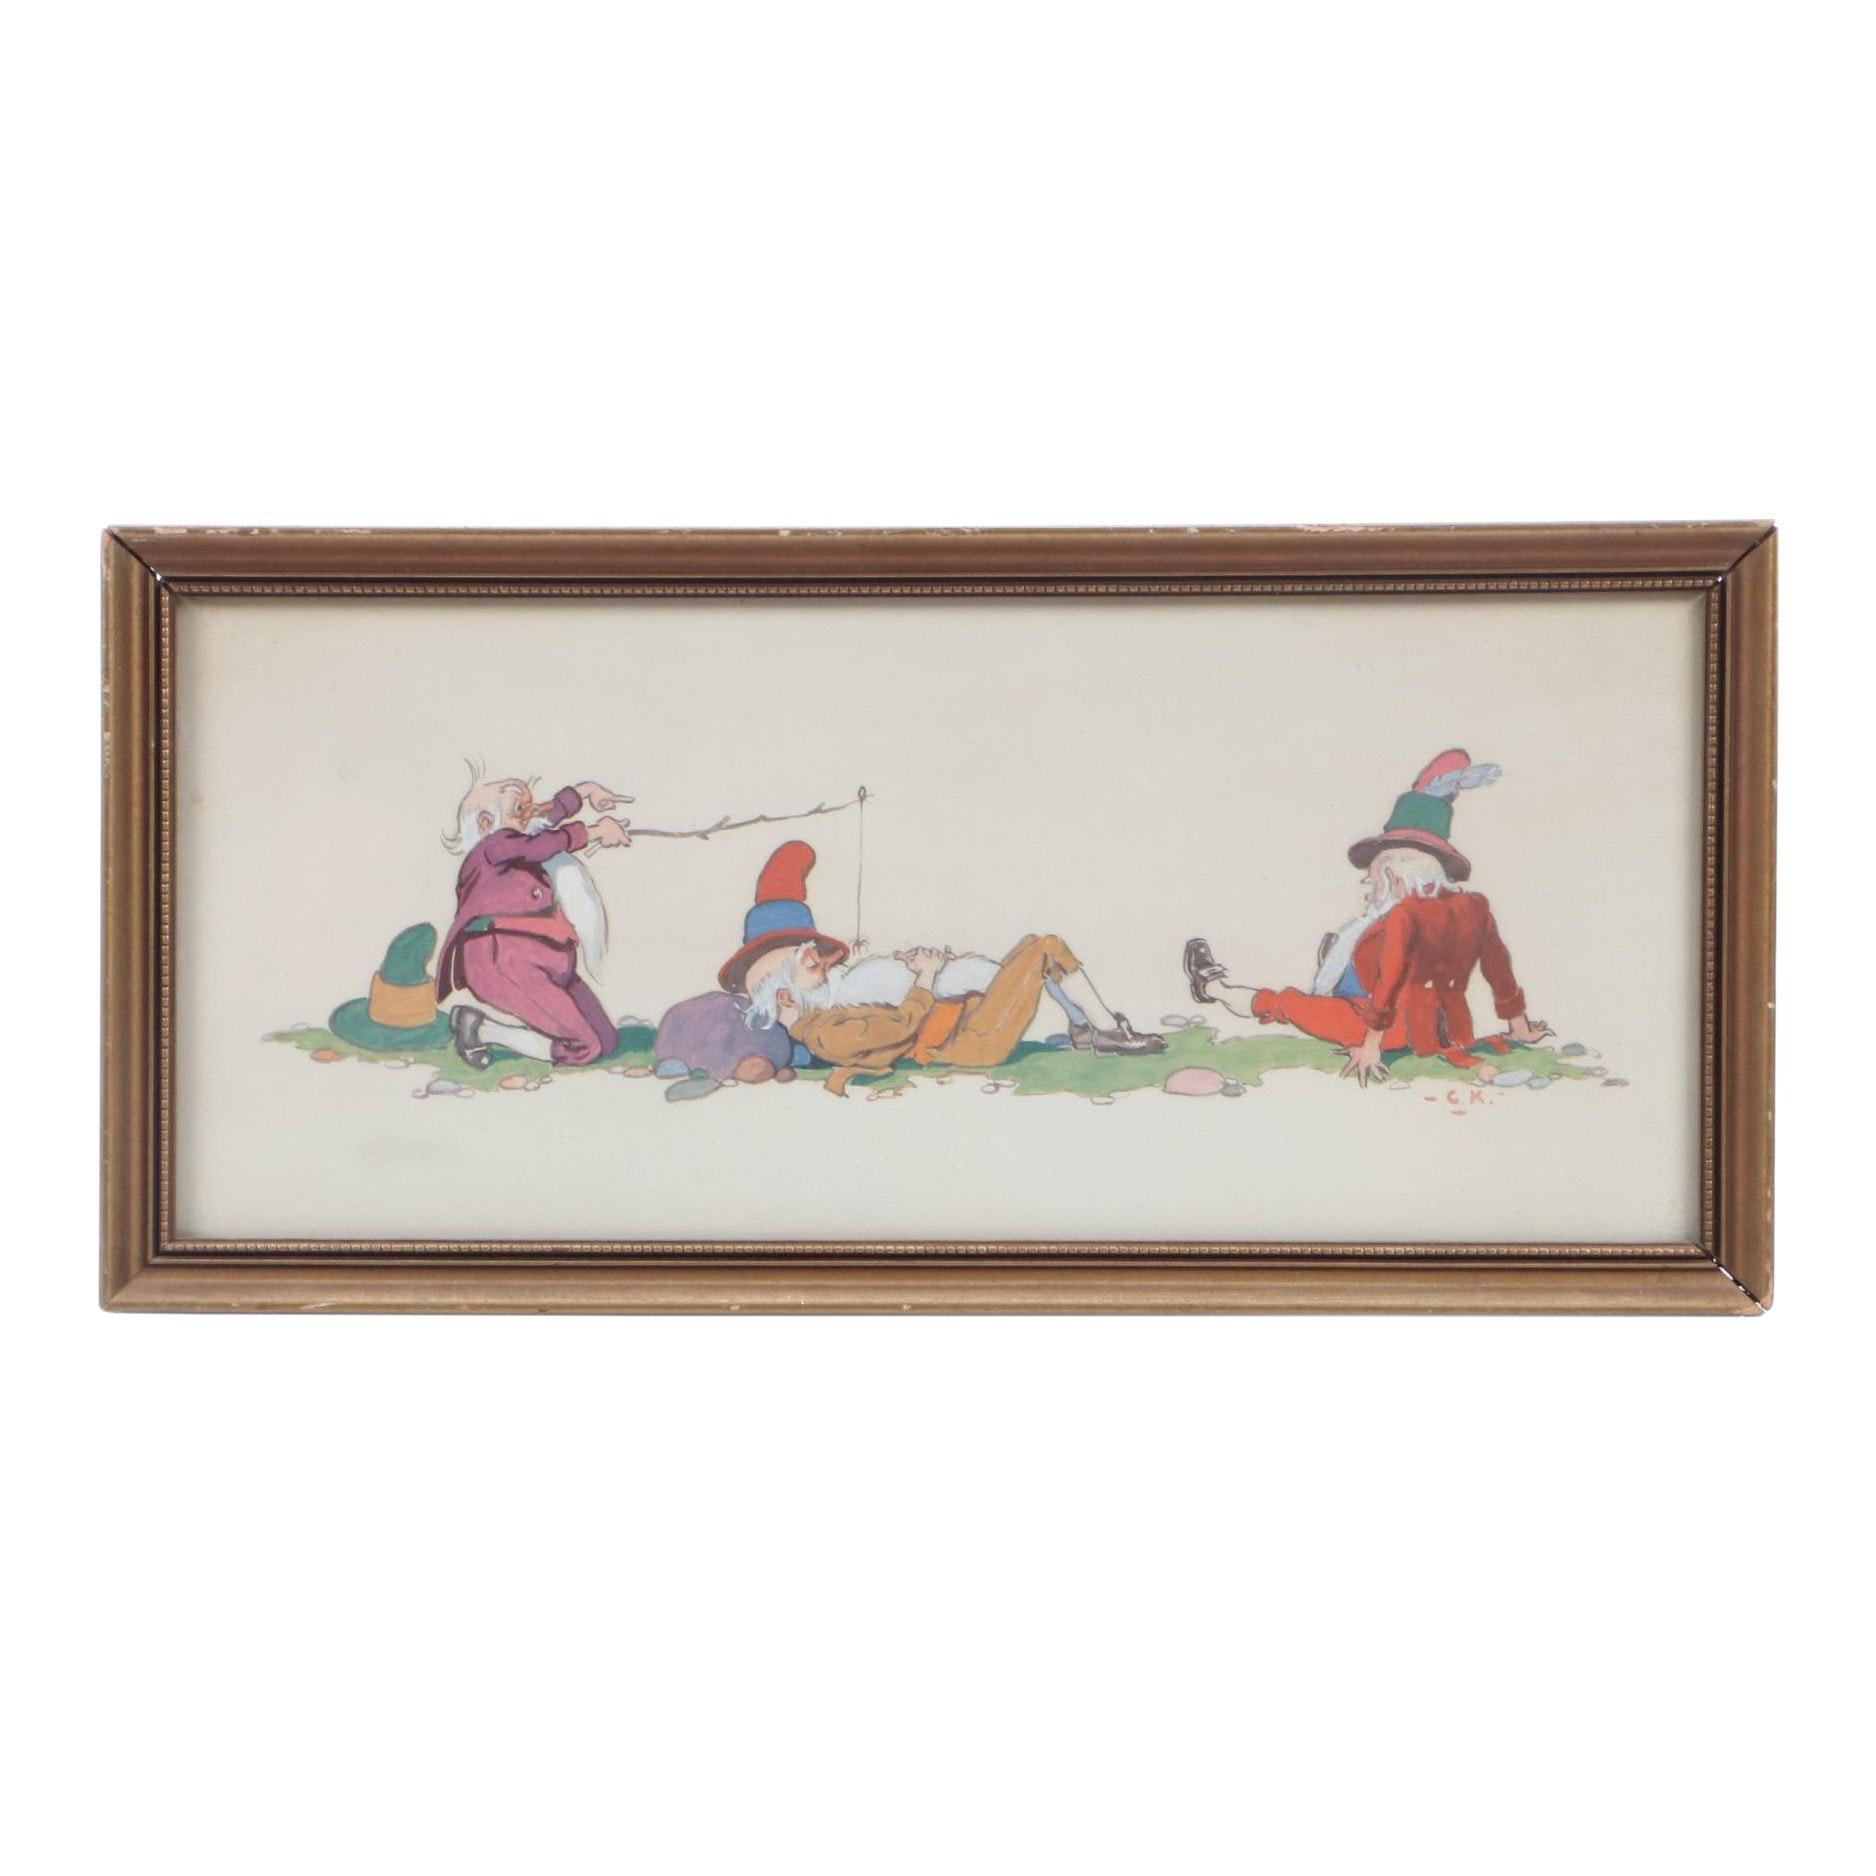 Benjamin Kilvert Gouache Illustration of Three Elven Men